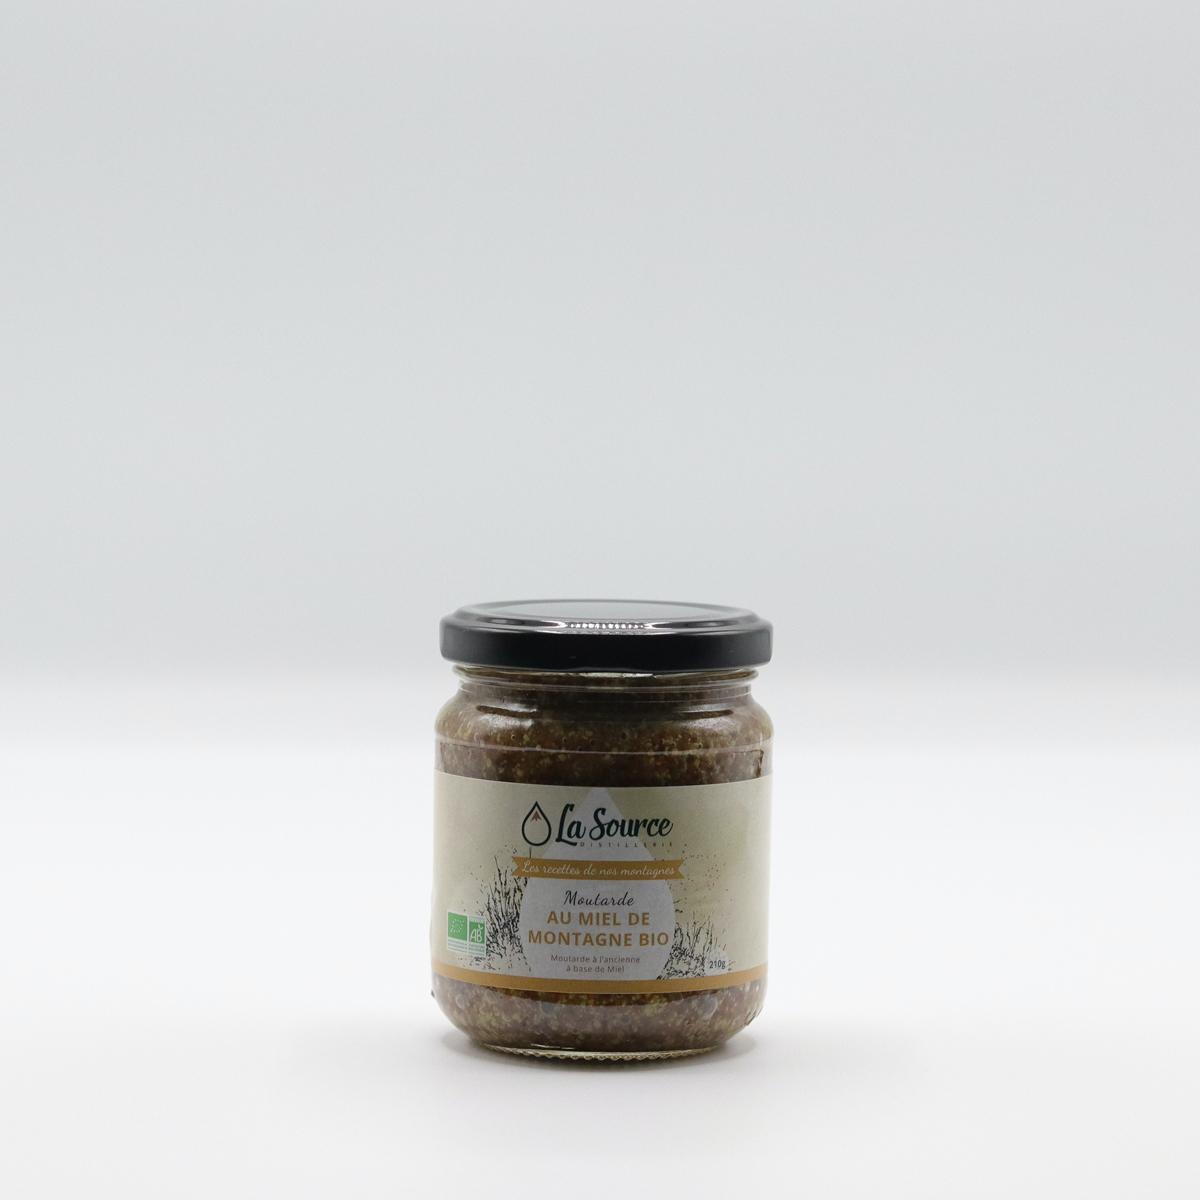 https://www.lasource-distillerie.fr/wp-content/uploads/2021/09/moutarde-miel-de-montagne.jpg